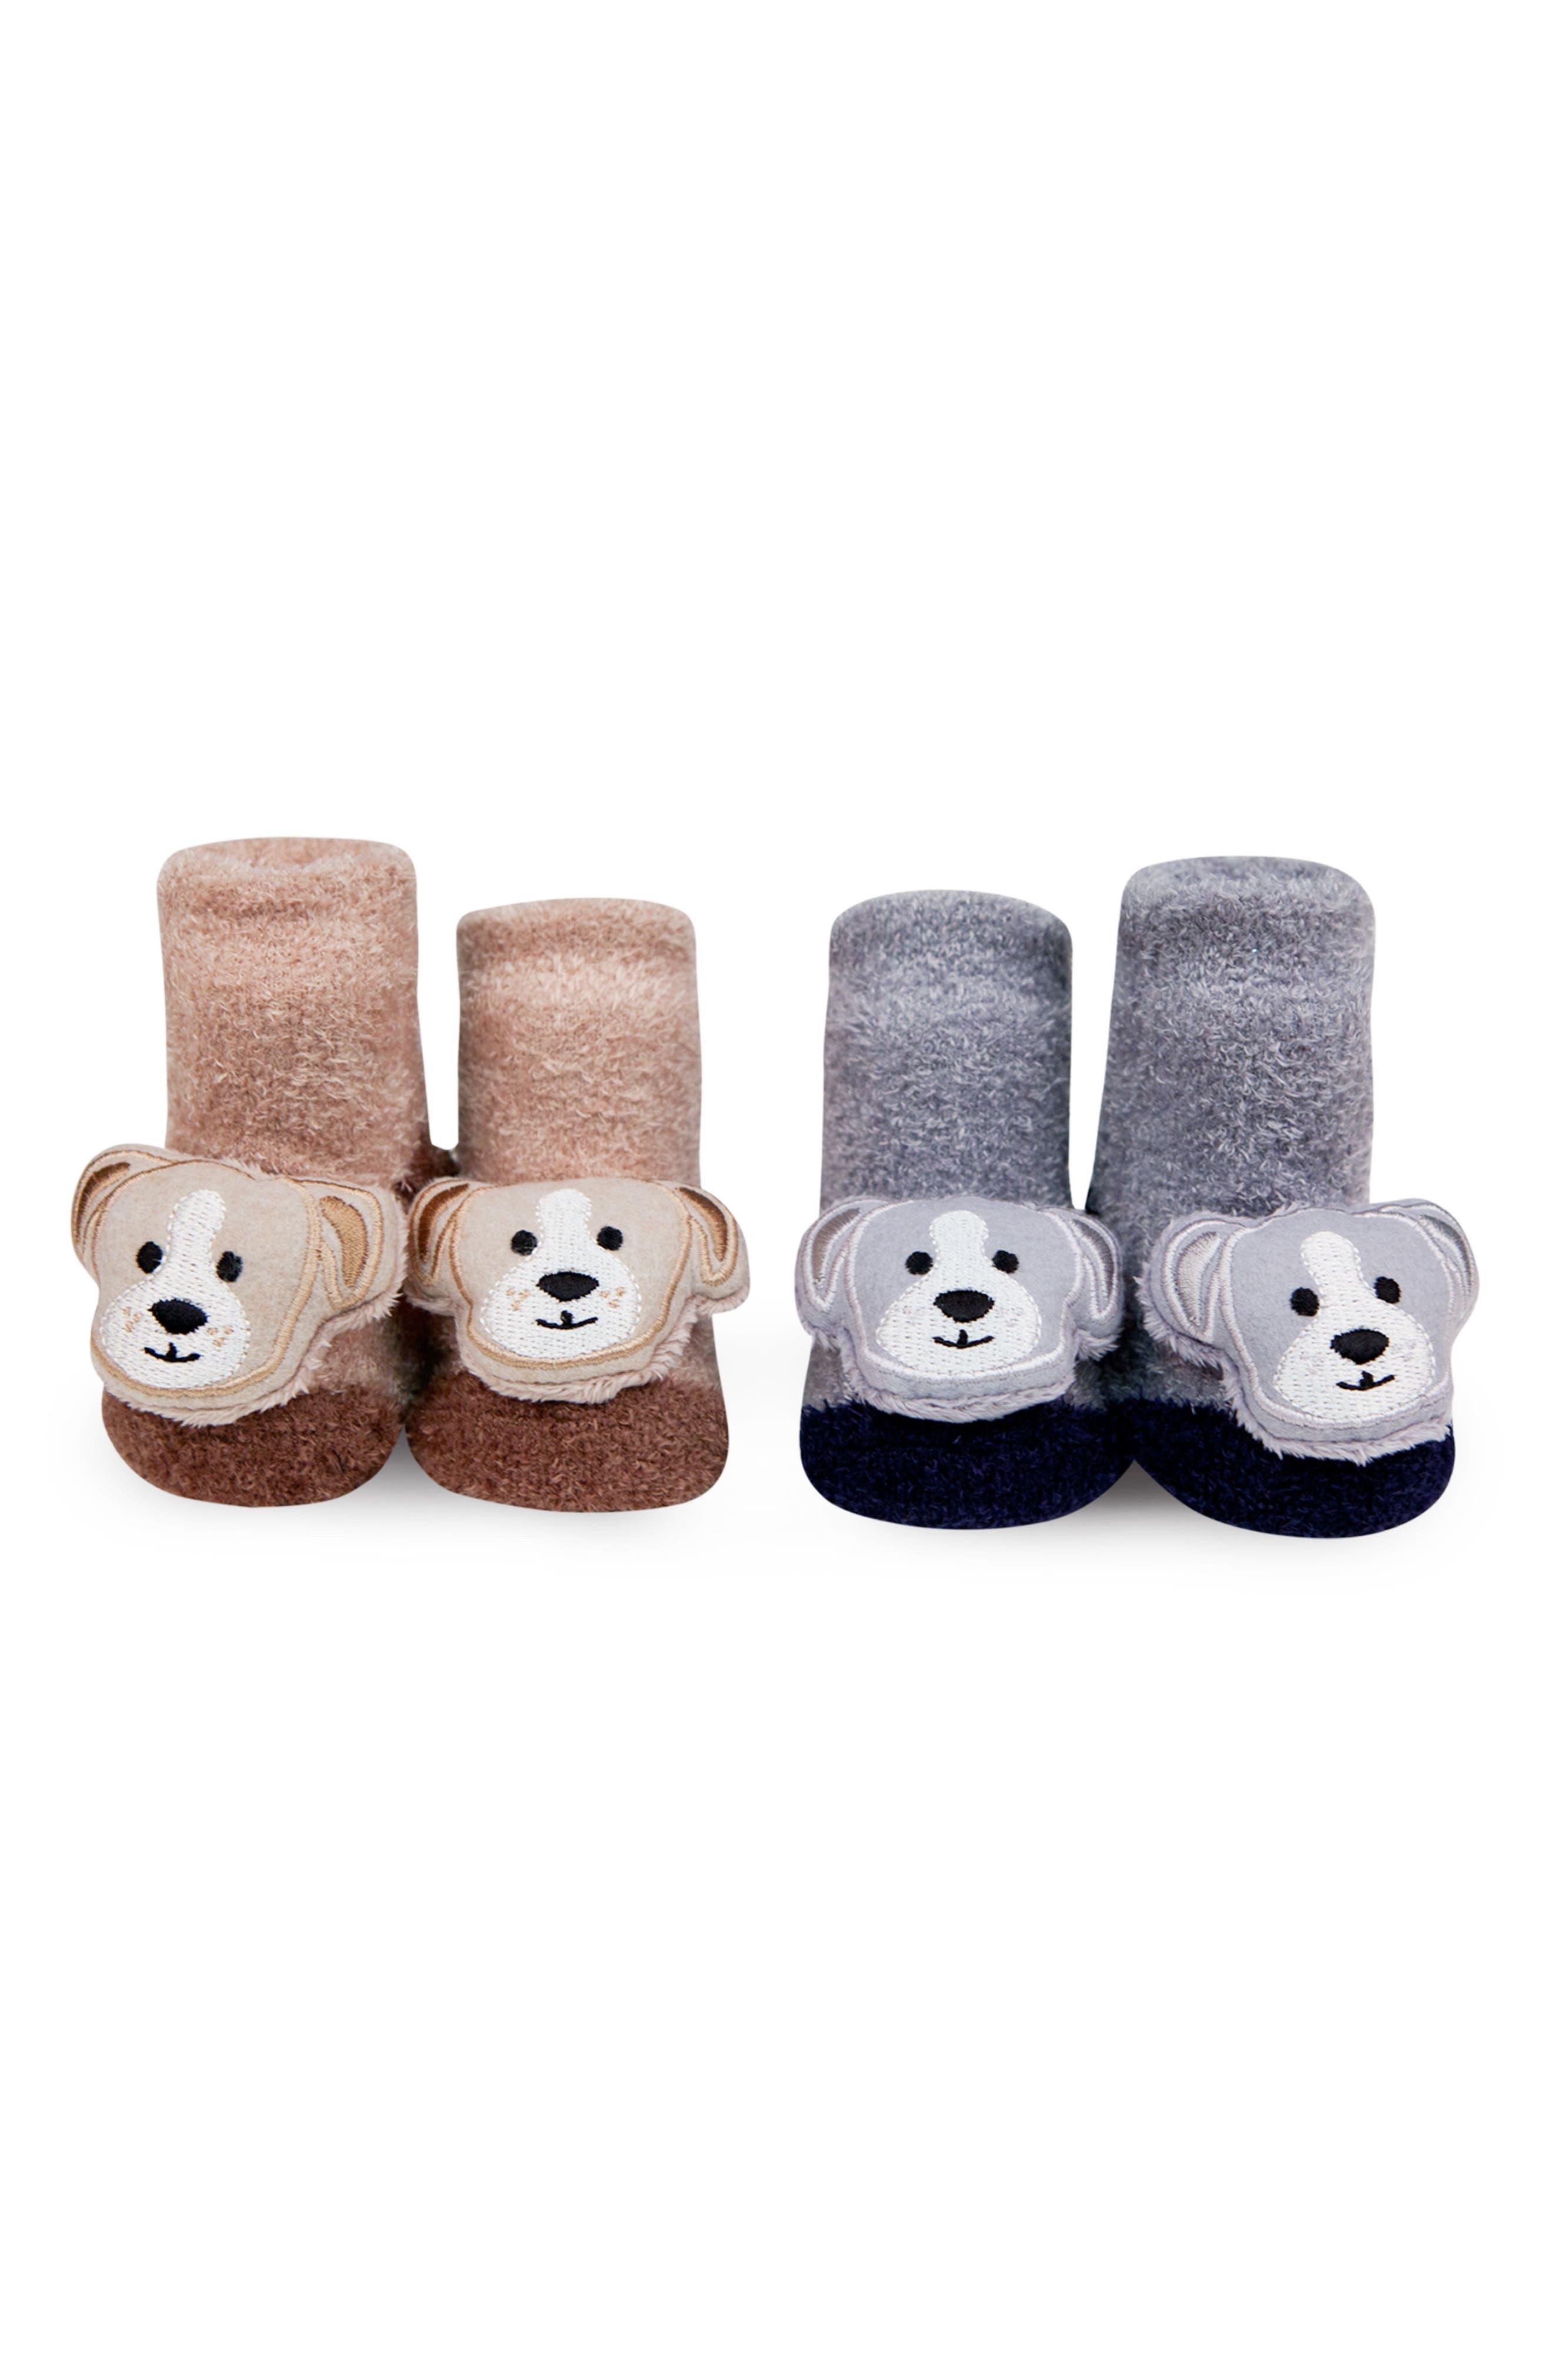 2-Pack Animal Rattle Socks,                             Main thumbnail 1, color,                             BROWN/ GREY